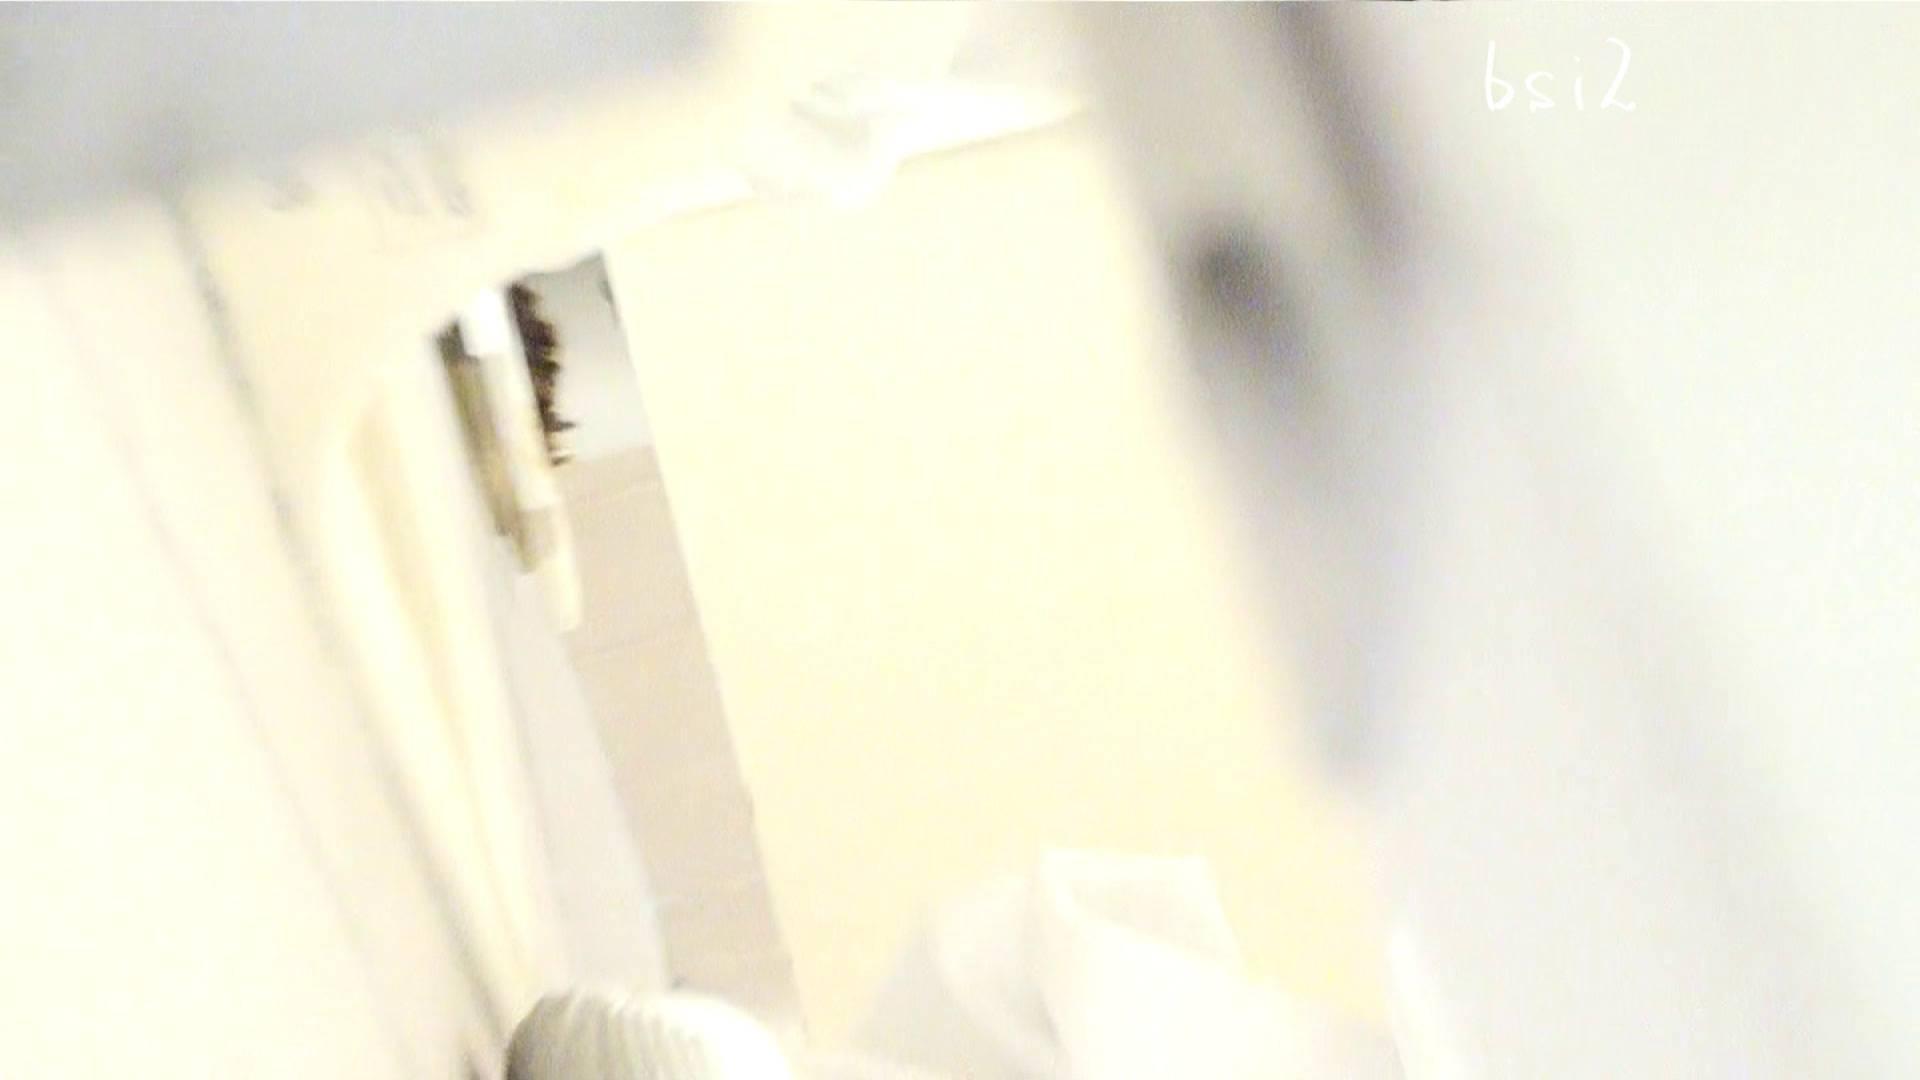 至高下半身盗撮-PREMIUM-【院内病棟編 】VOL2 OLの実態   盗撮  67pic 49